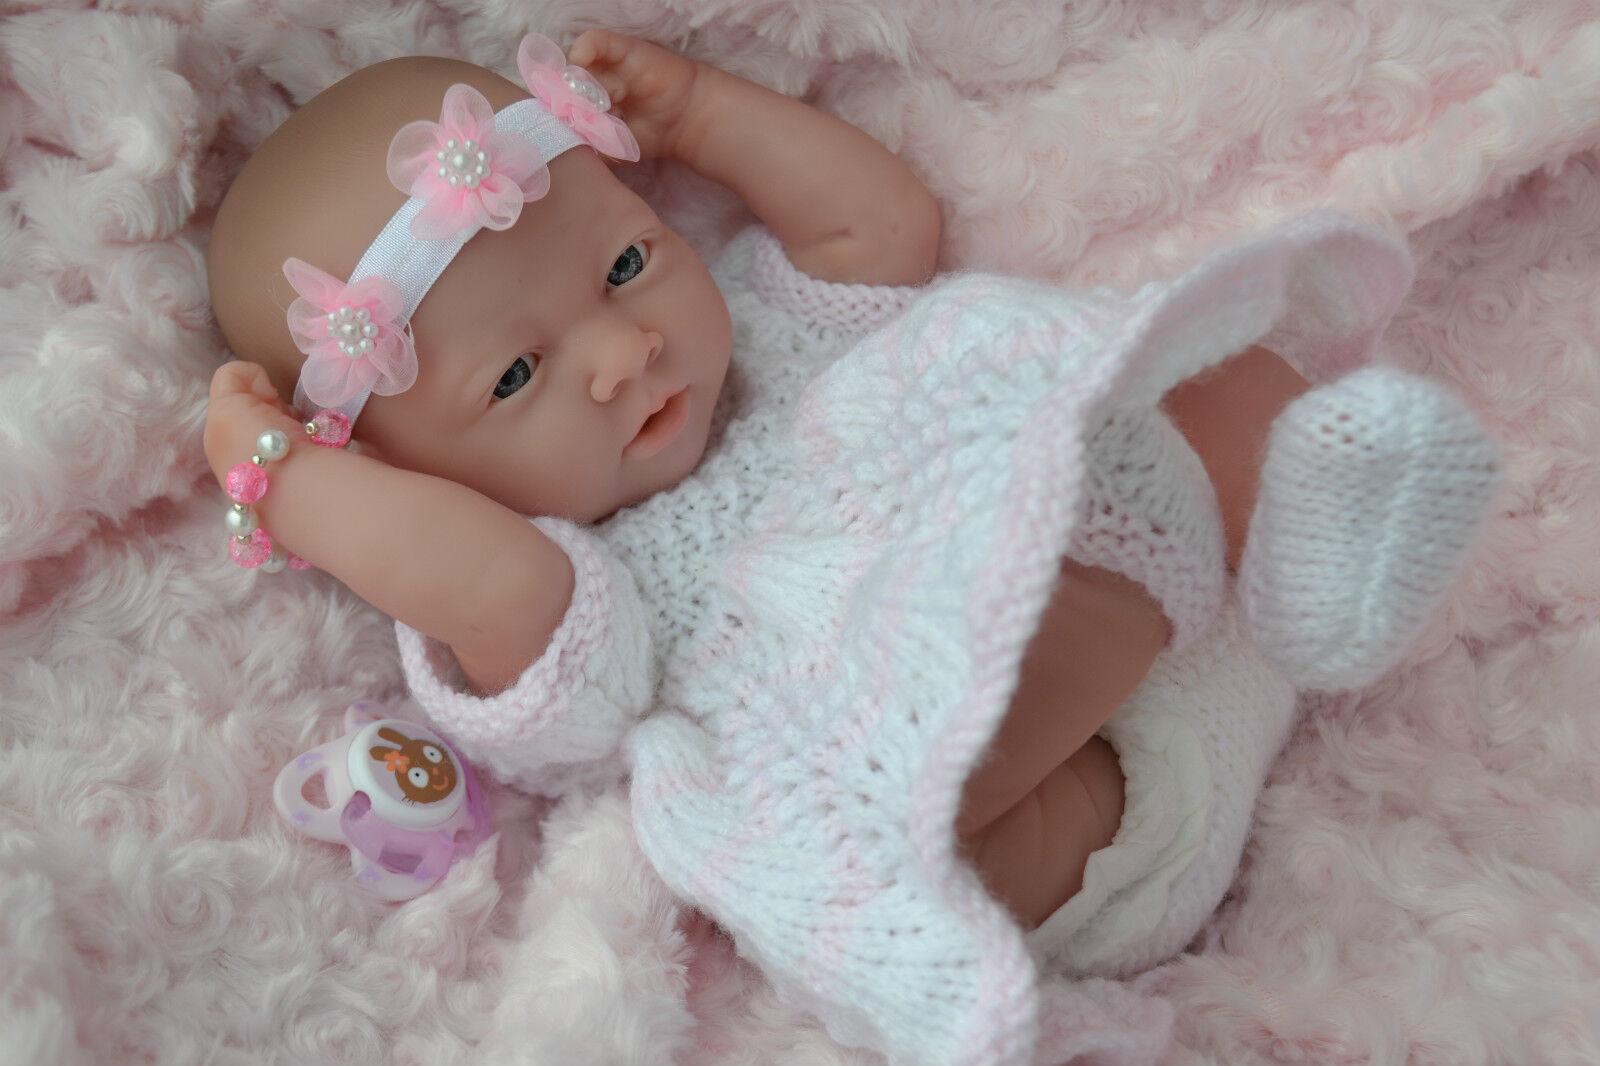 PJs  ESME   REALISTIC BABY GIRL DOLL BERENGUER LA NEWBORN +  EXTRAS REBORN  PLAY